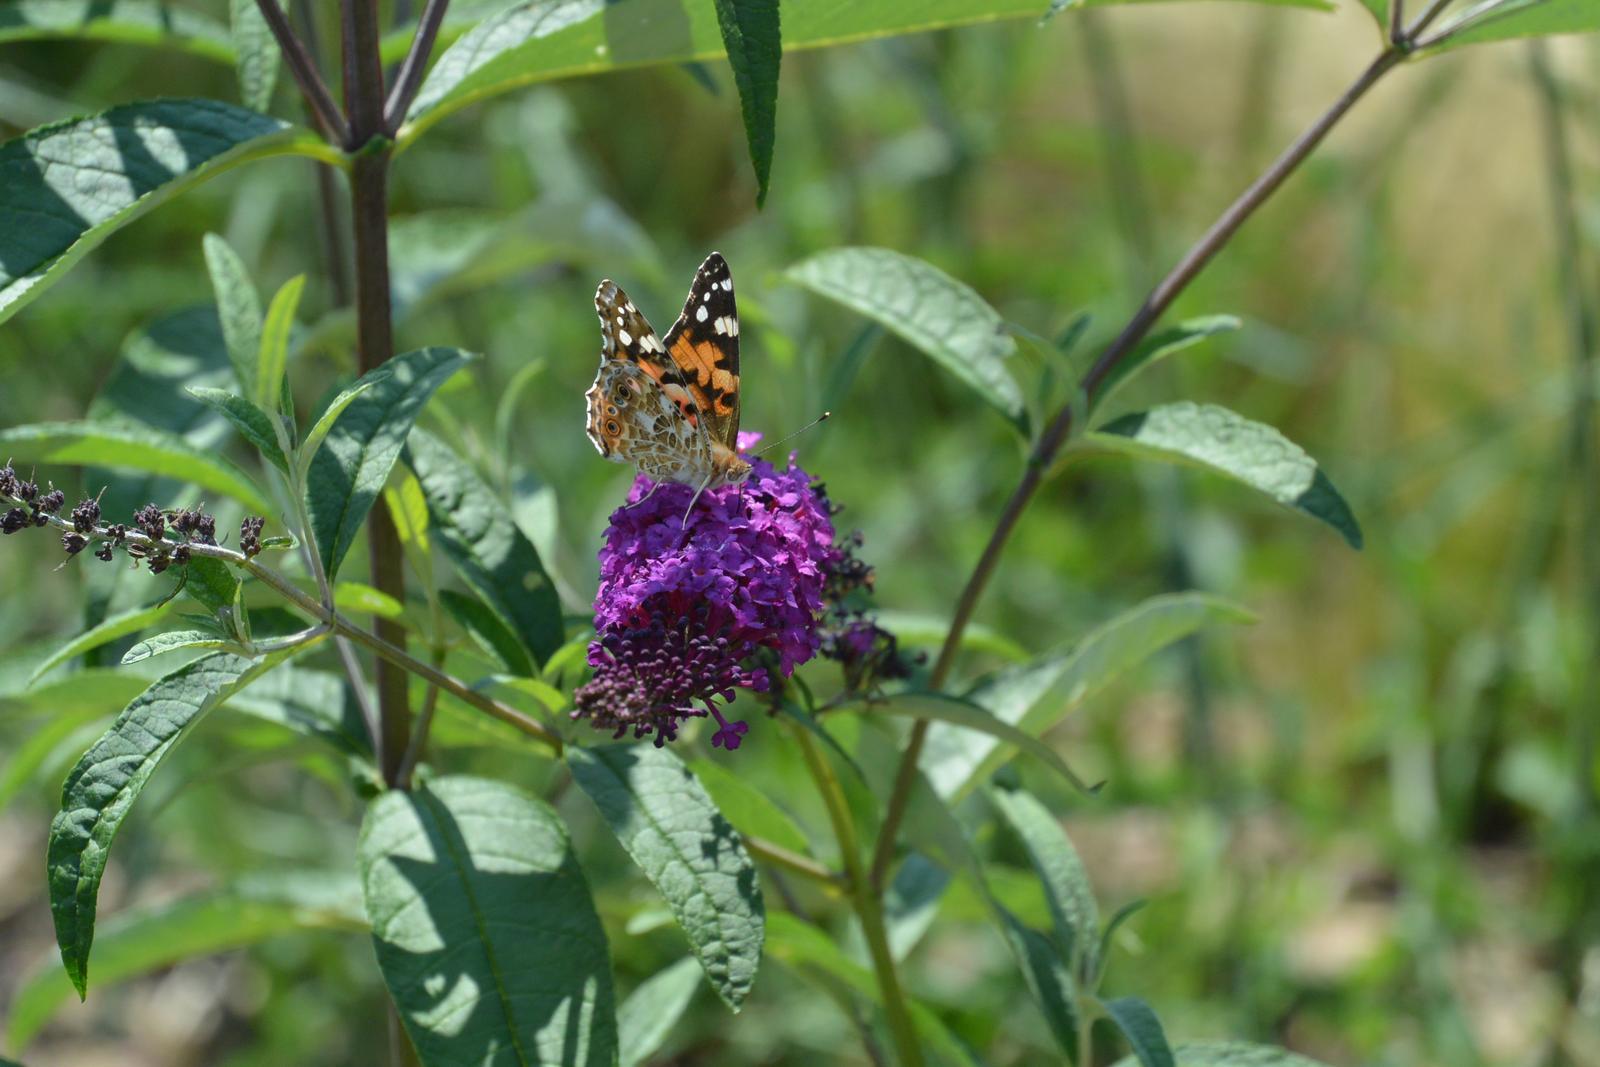 Motýlí zahrada 2019-2020 - Obrázek č. 15